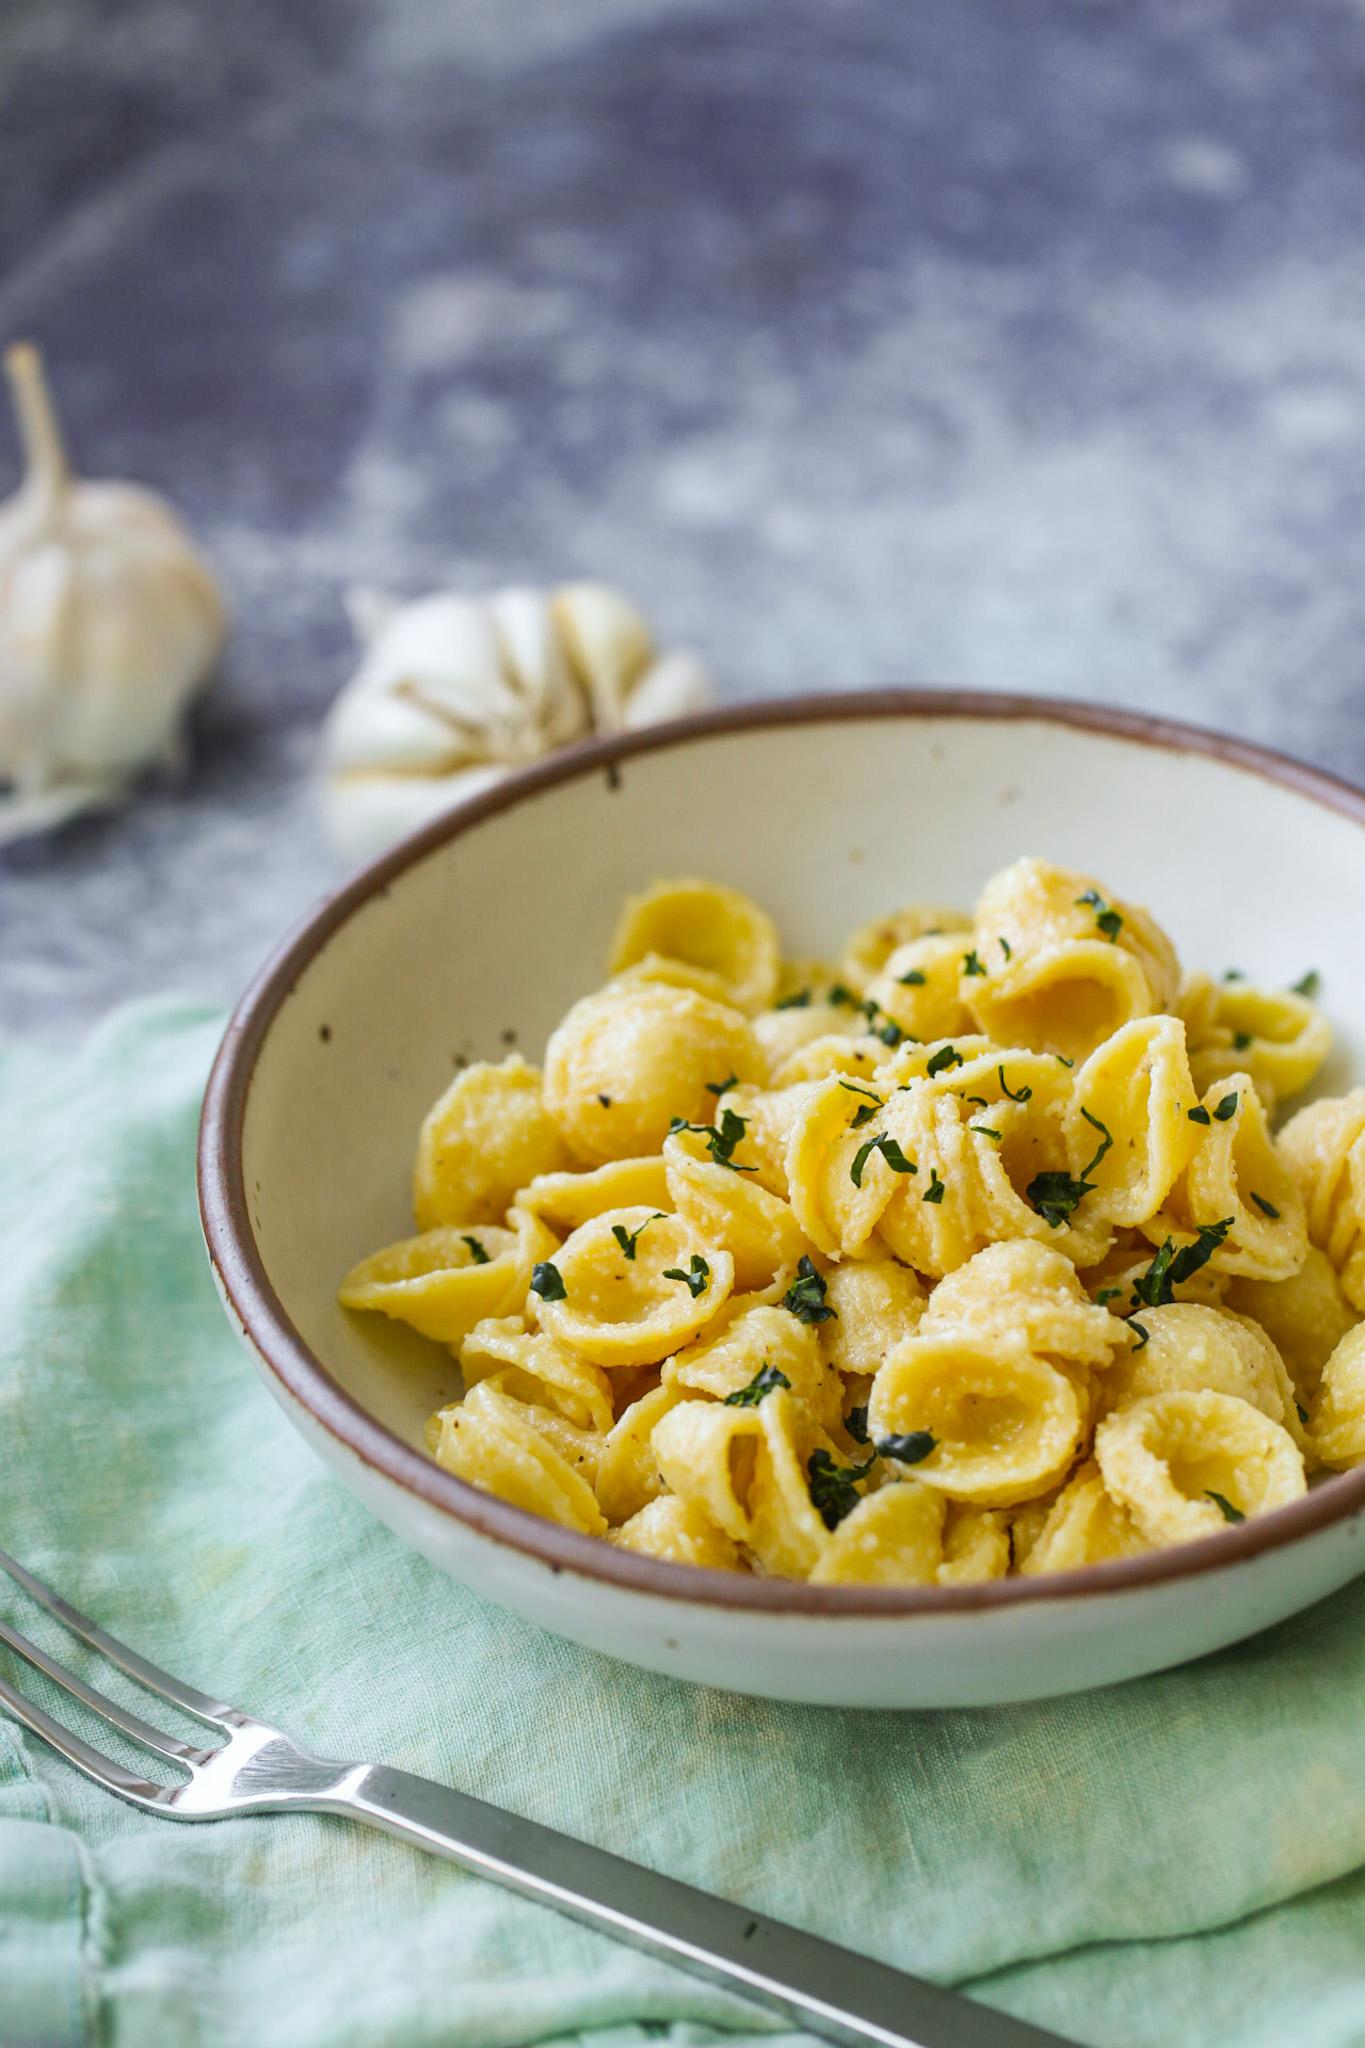 Aglio e Olio Pasta with kale on top